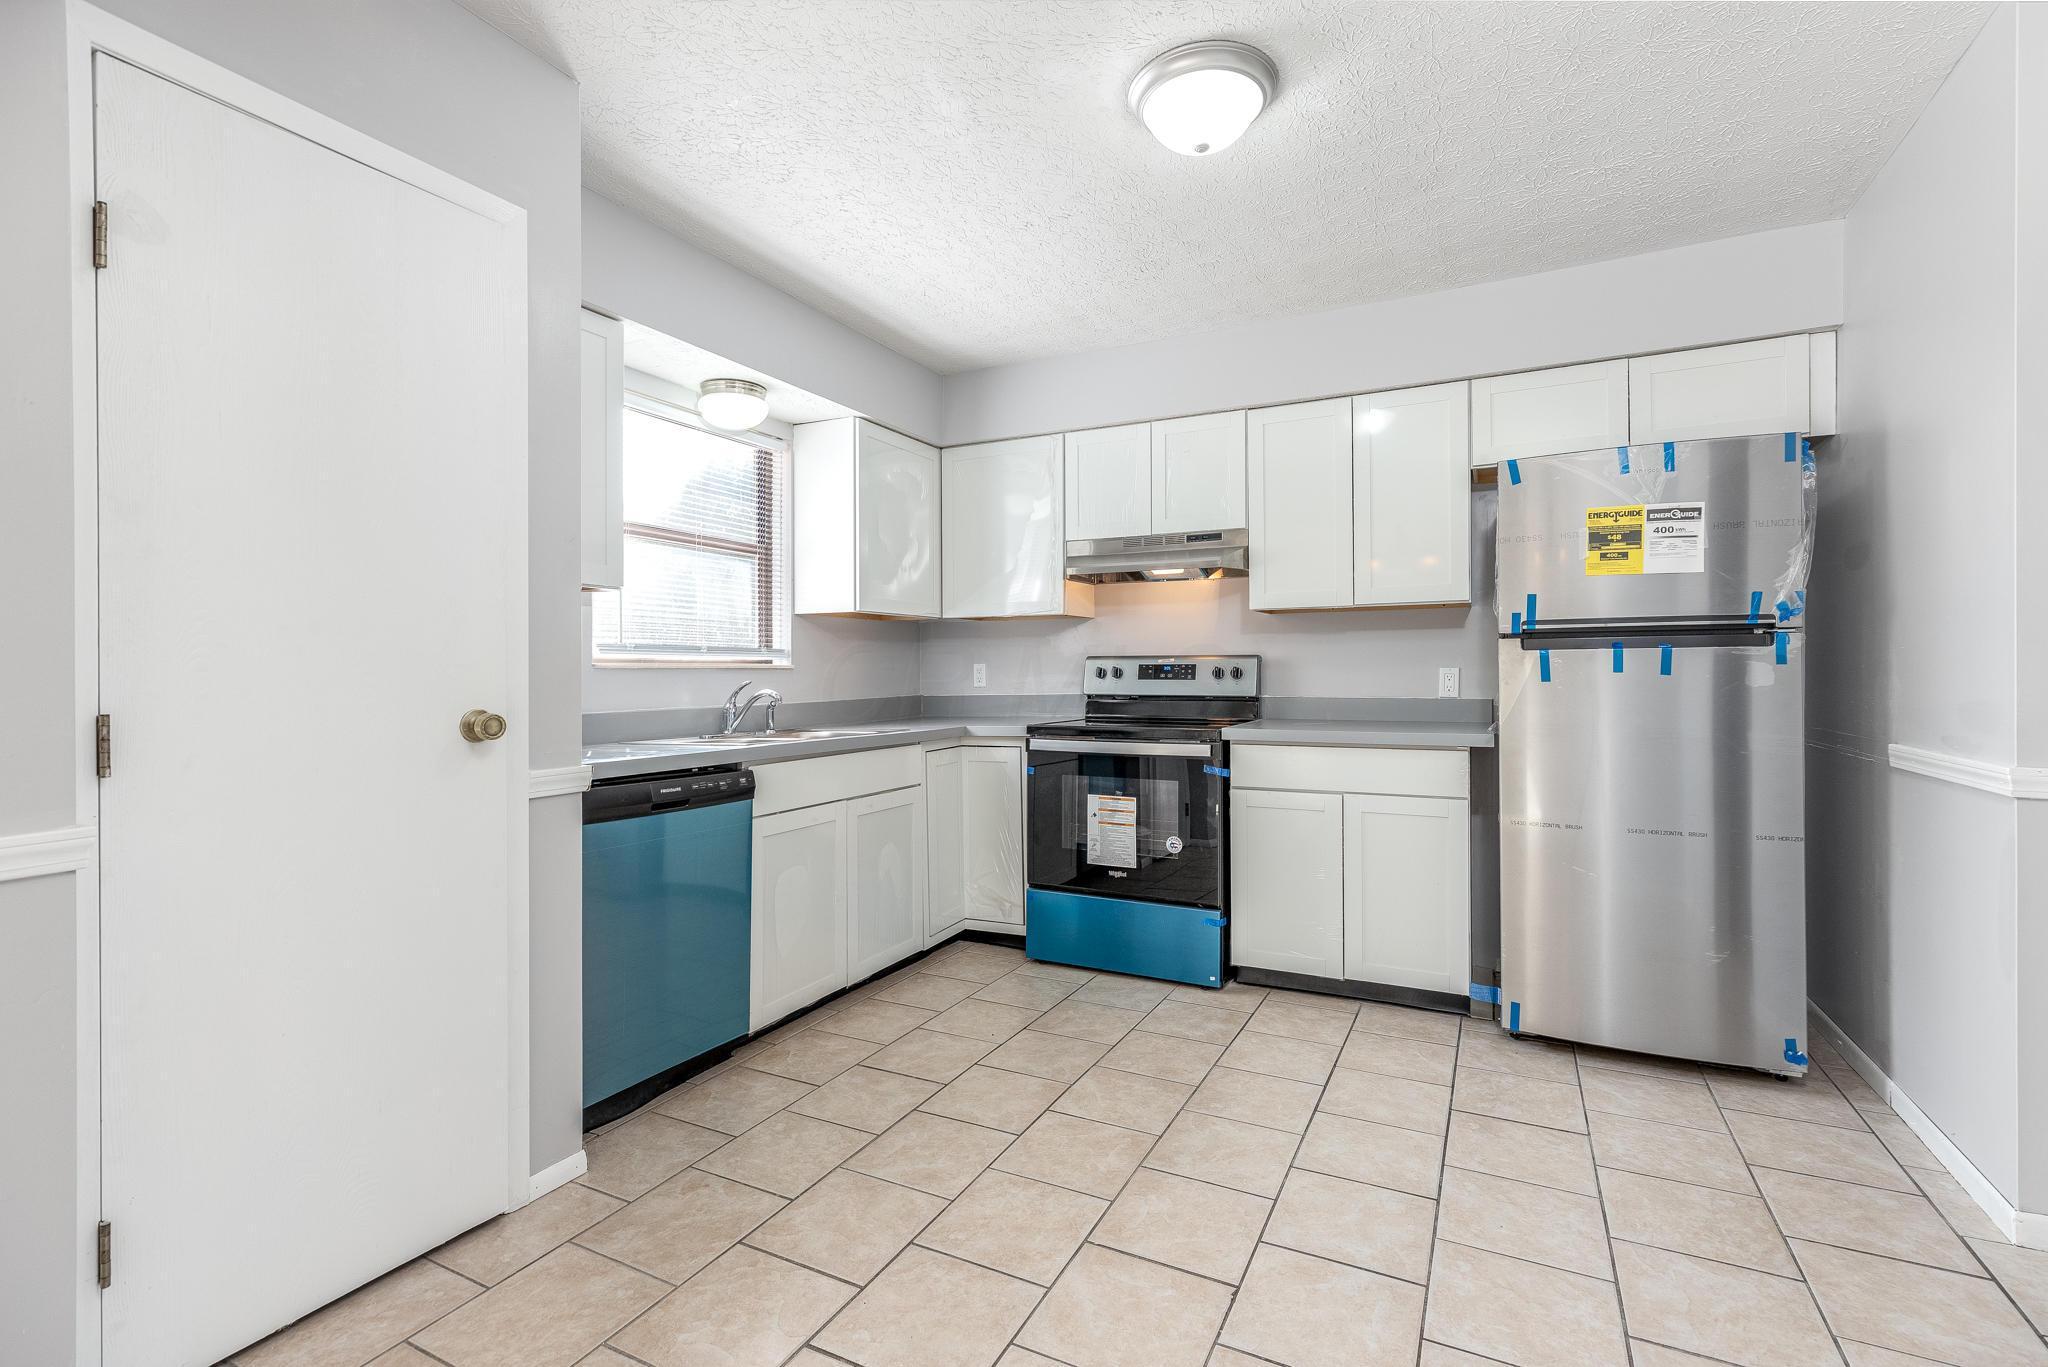 1262 Snohomish Avenue, Worthington, Ohio 43085, 3 Bedrooms Bedrooms, ,3 BathroomsBathrooms,Residential,For Sale,Snohomish,220031912